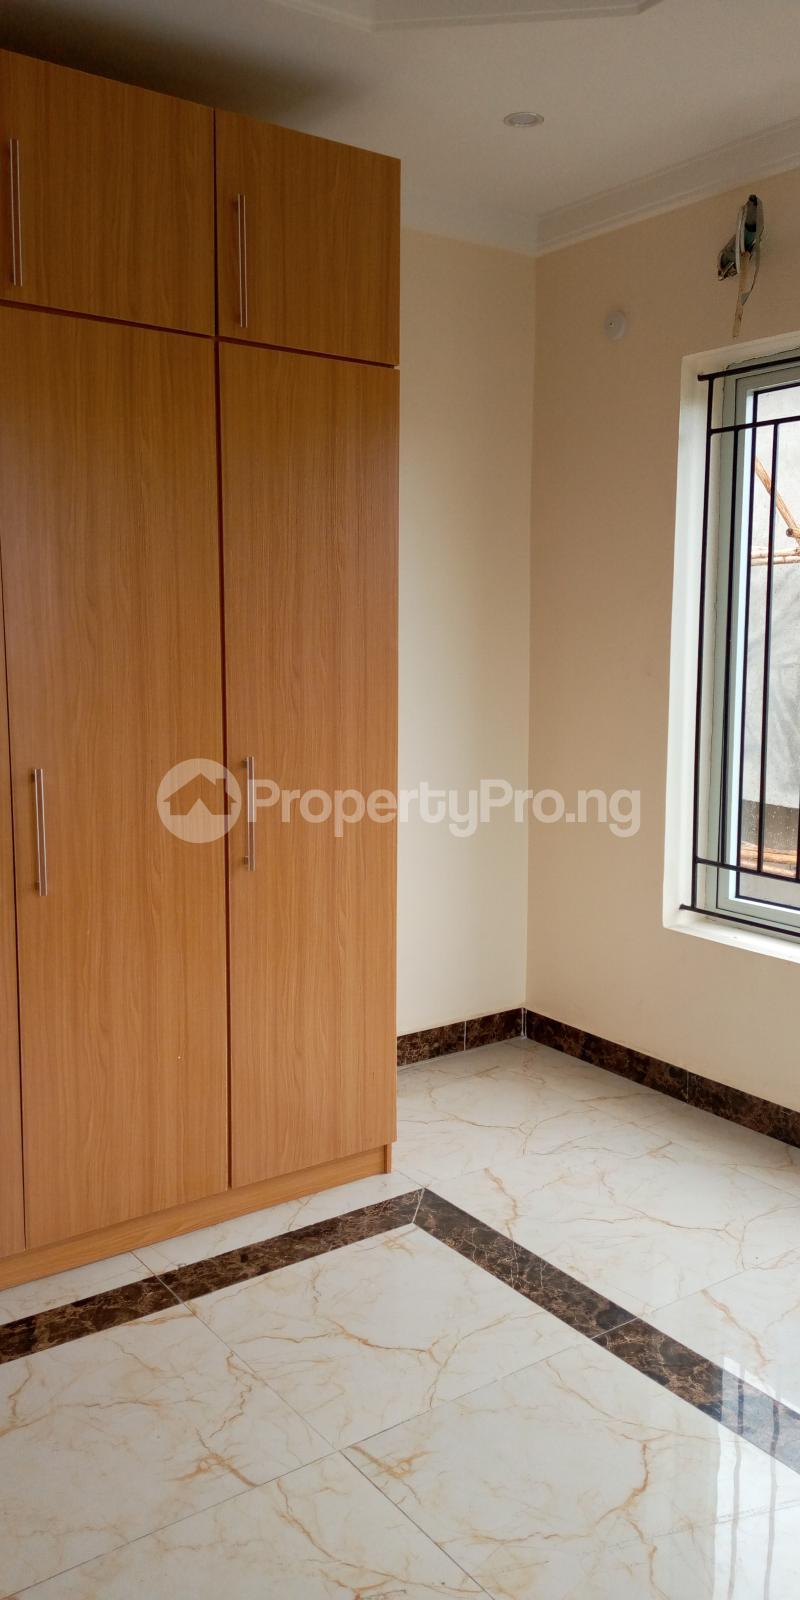 5 bedroom Detached Duplex House for rent Peace Gardens Estate Monastery road Sangotedo Lagos - 11